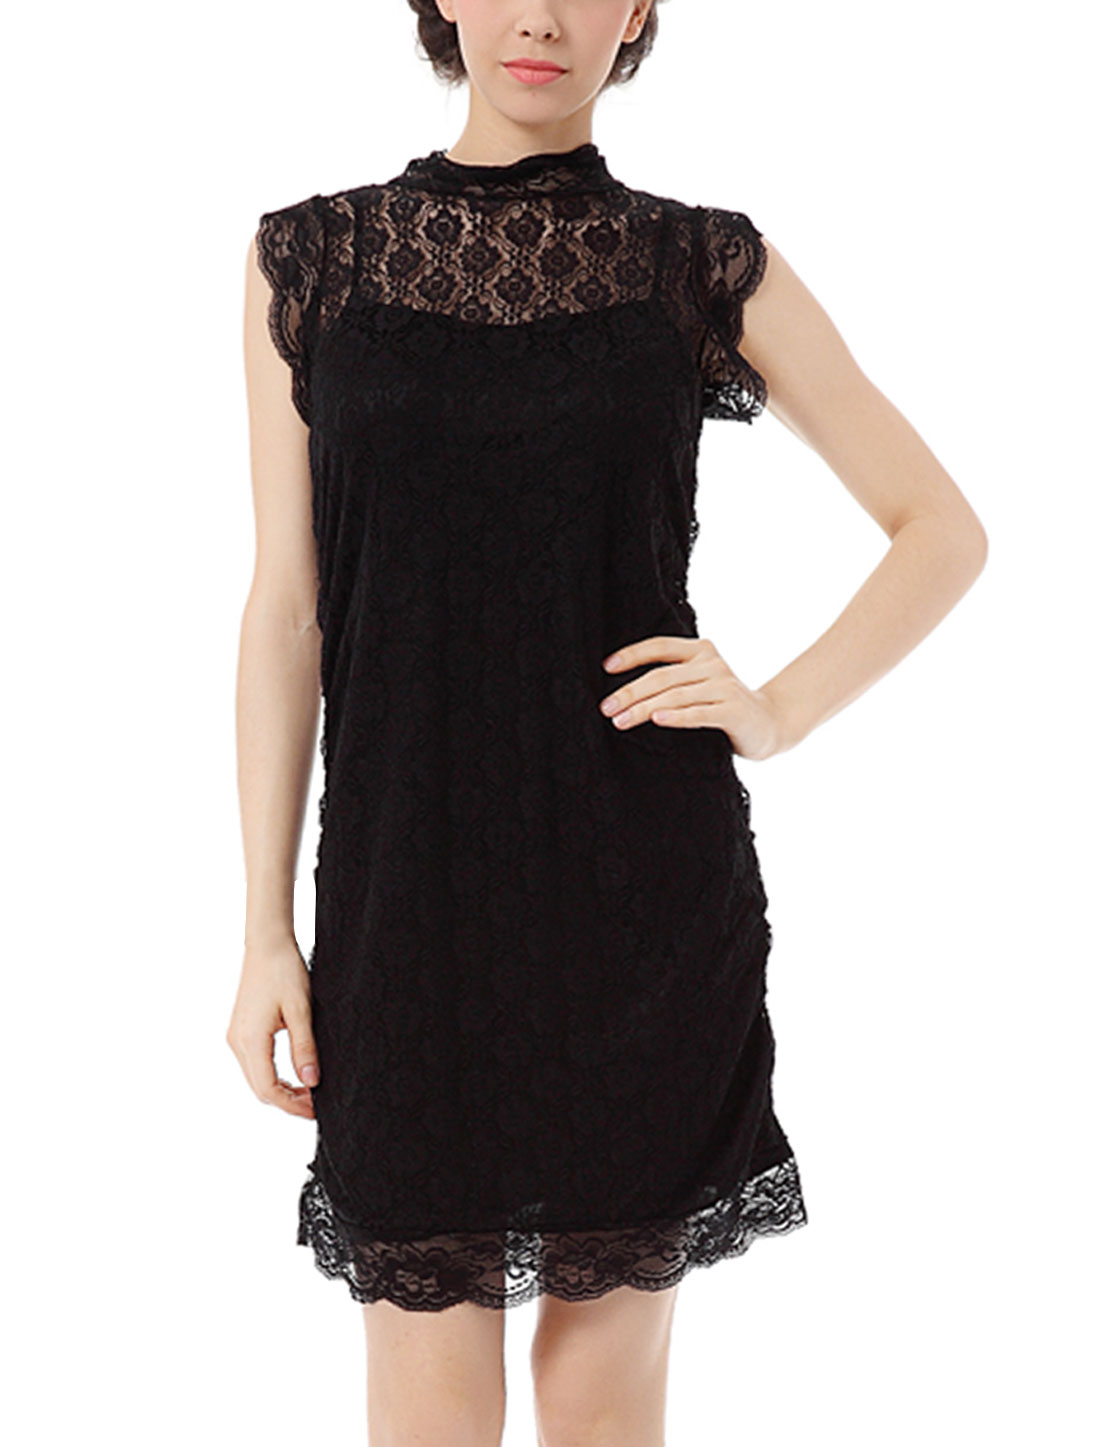 Ladies Black Sheer Stand Collar Sleeveless Mini Dress XS